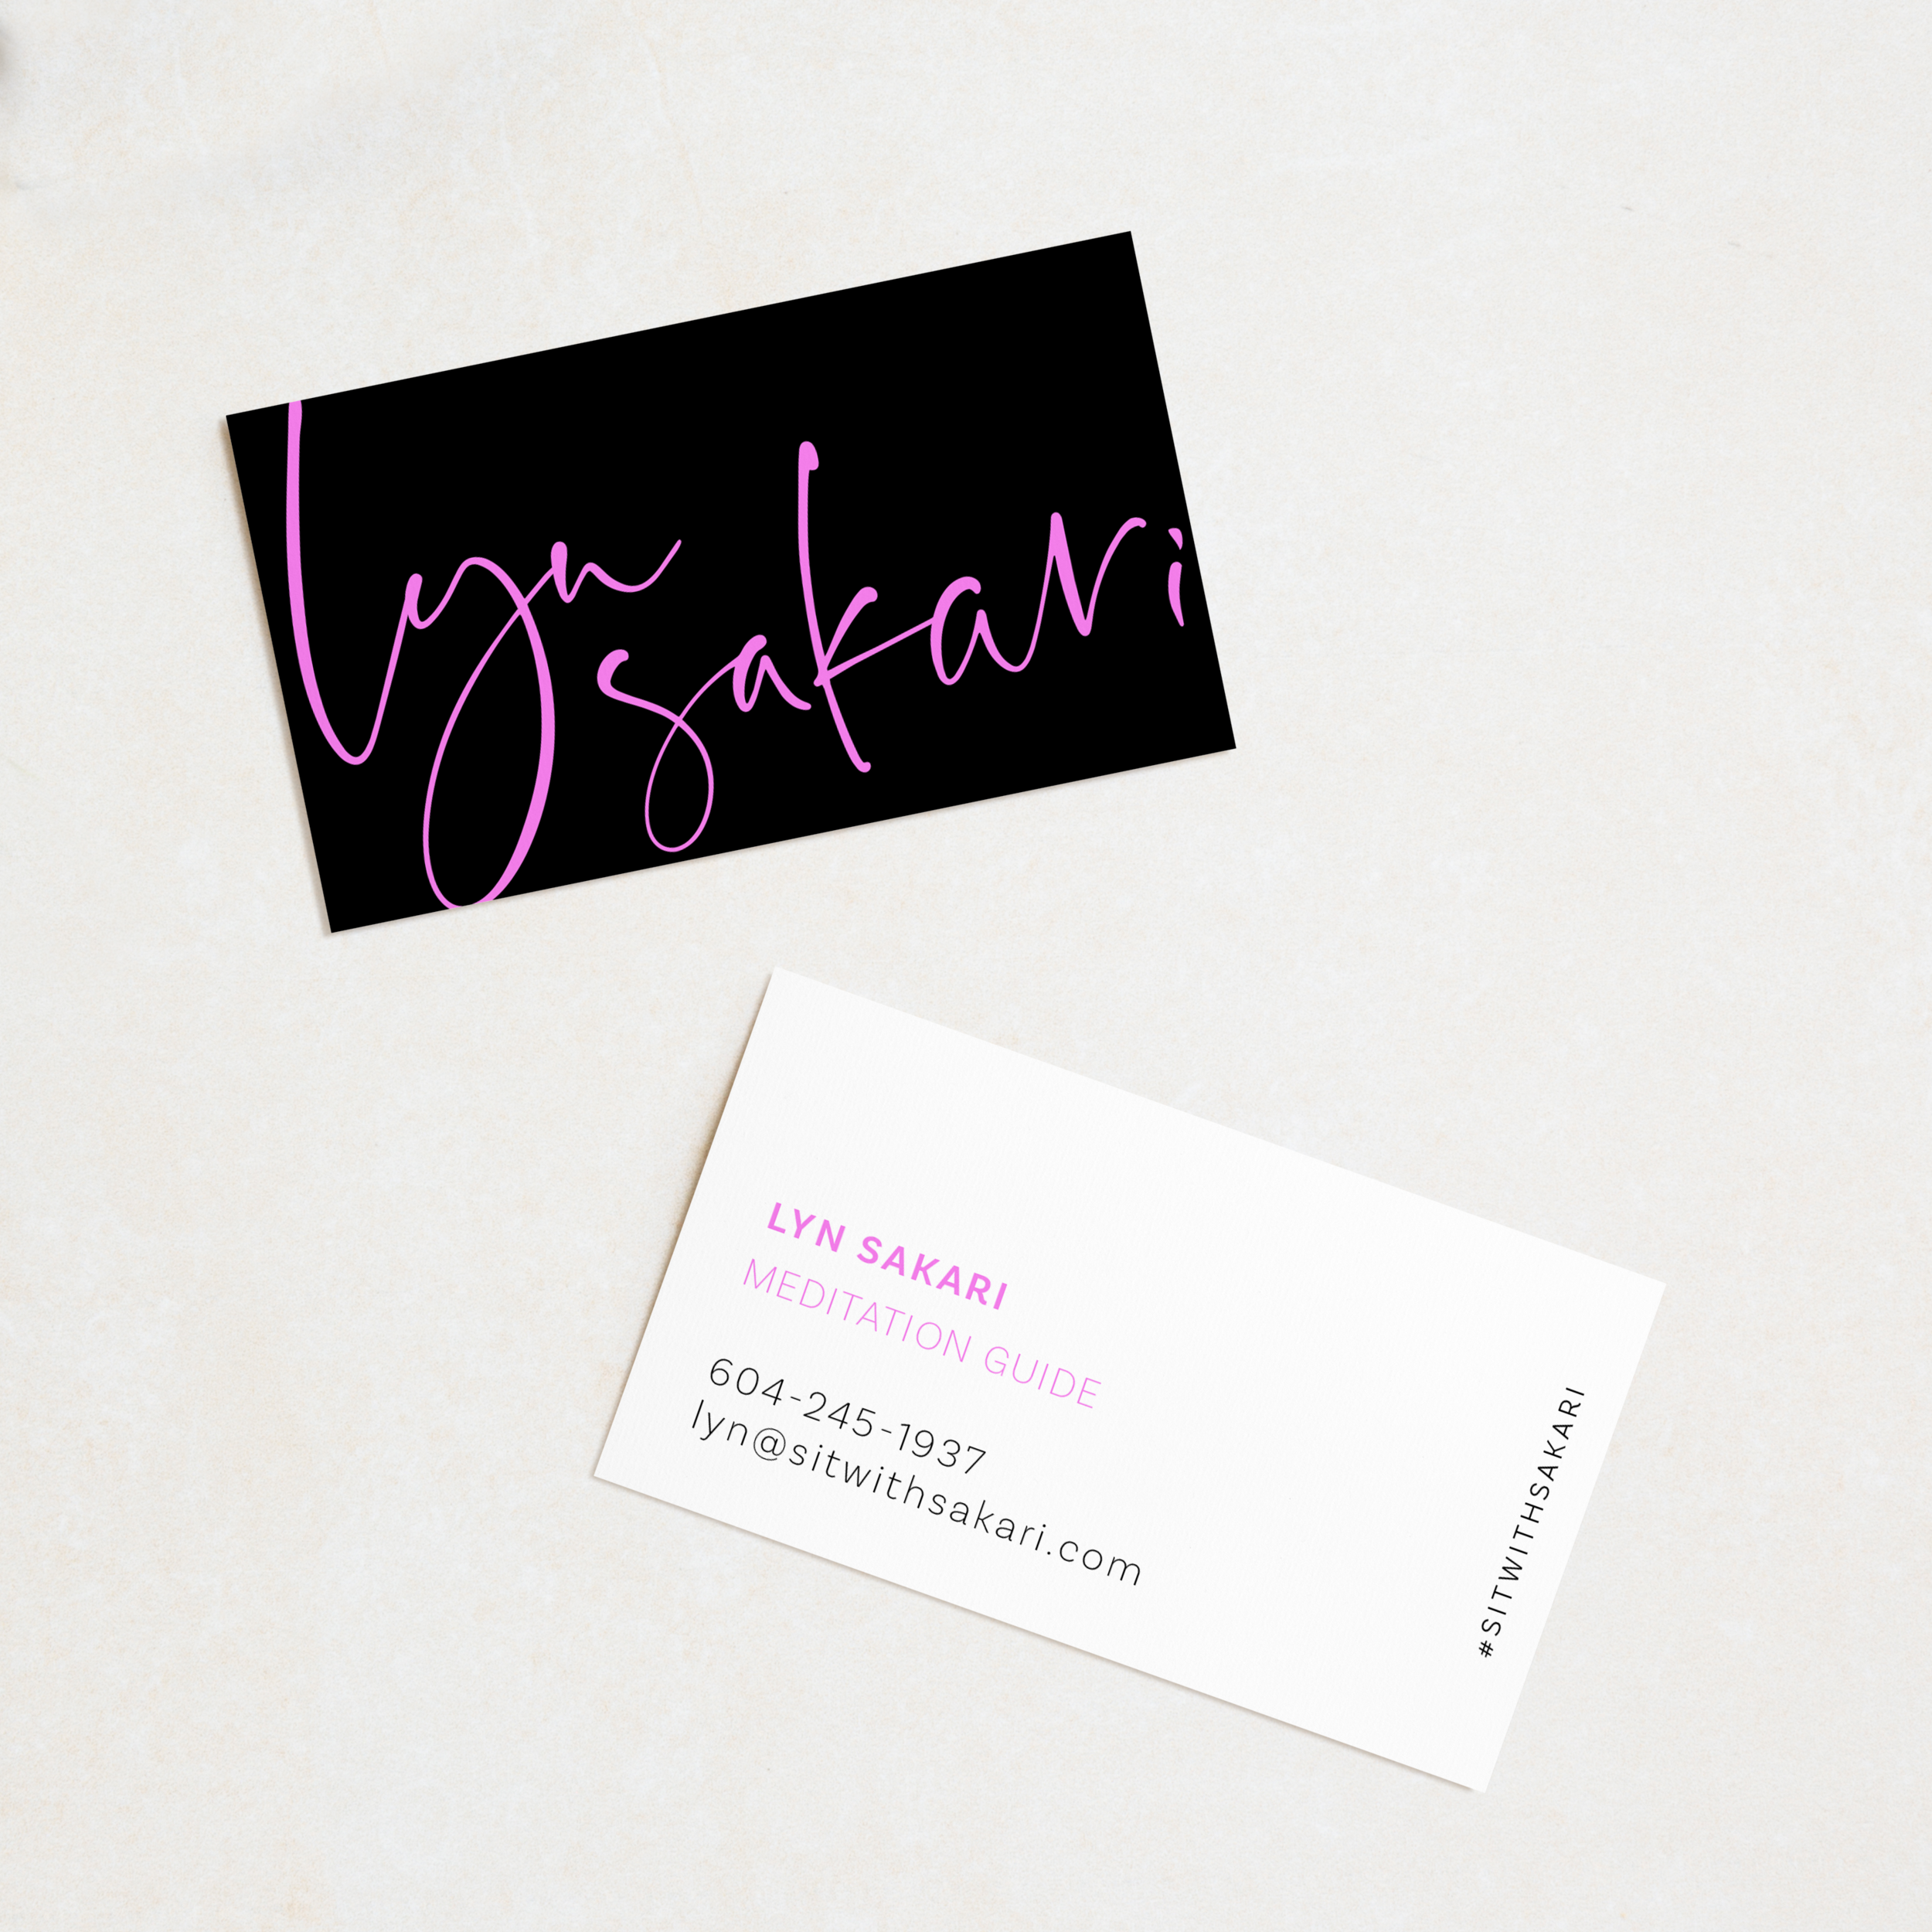 Lyn Sakari black and pink business cards